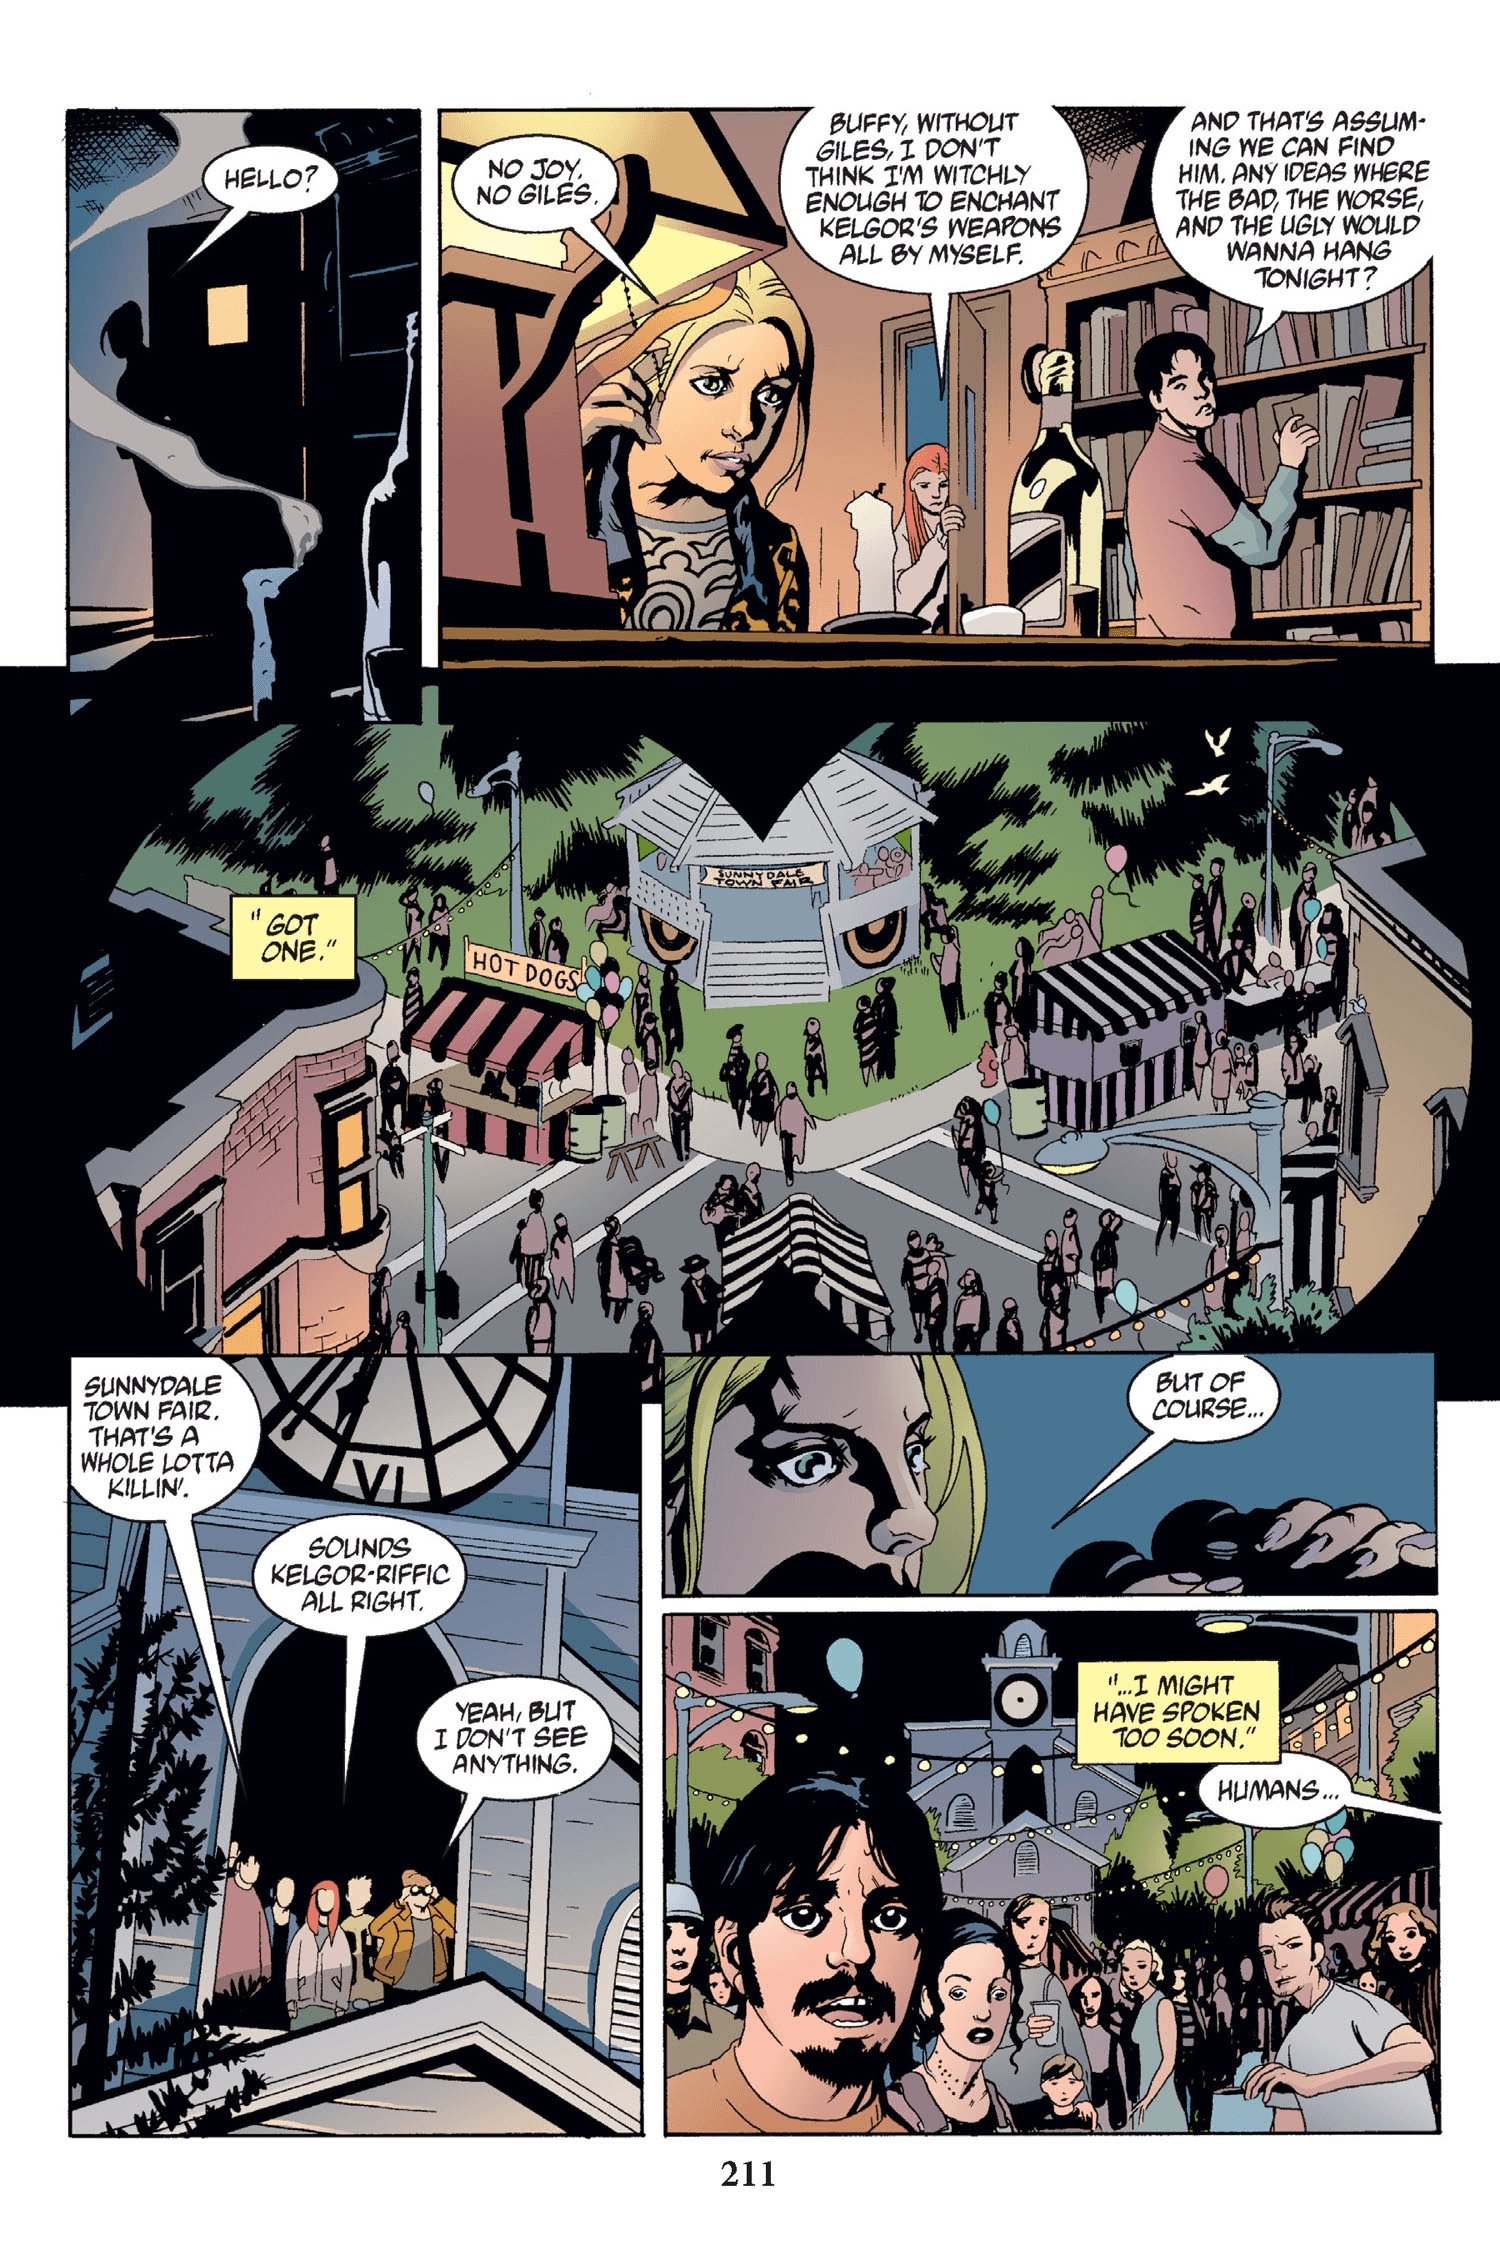 Read online Buffy the Vampire Slayer: Omnibus comic -  Issue # TPB 2 - 205